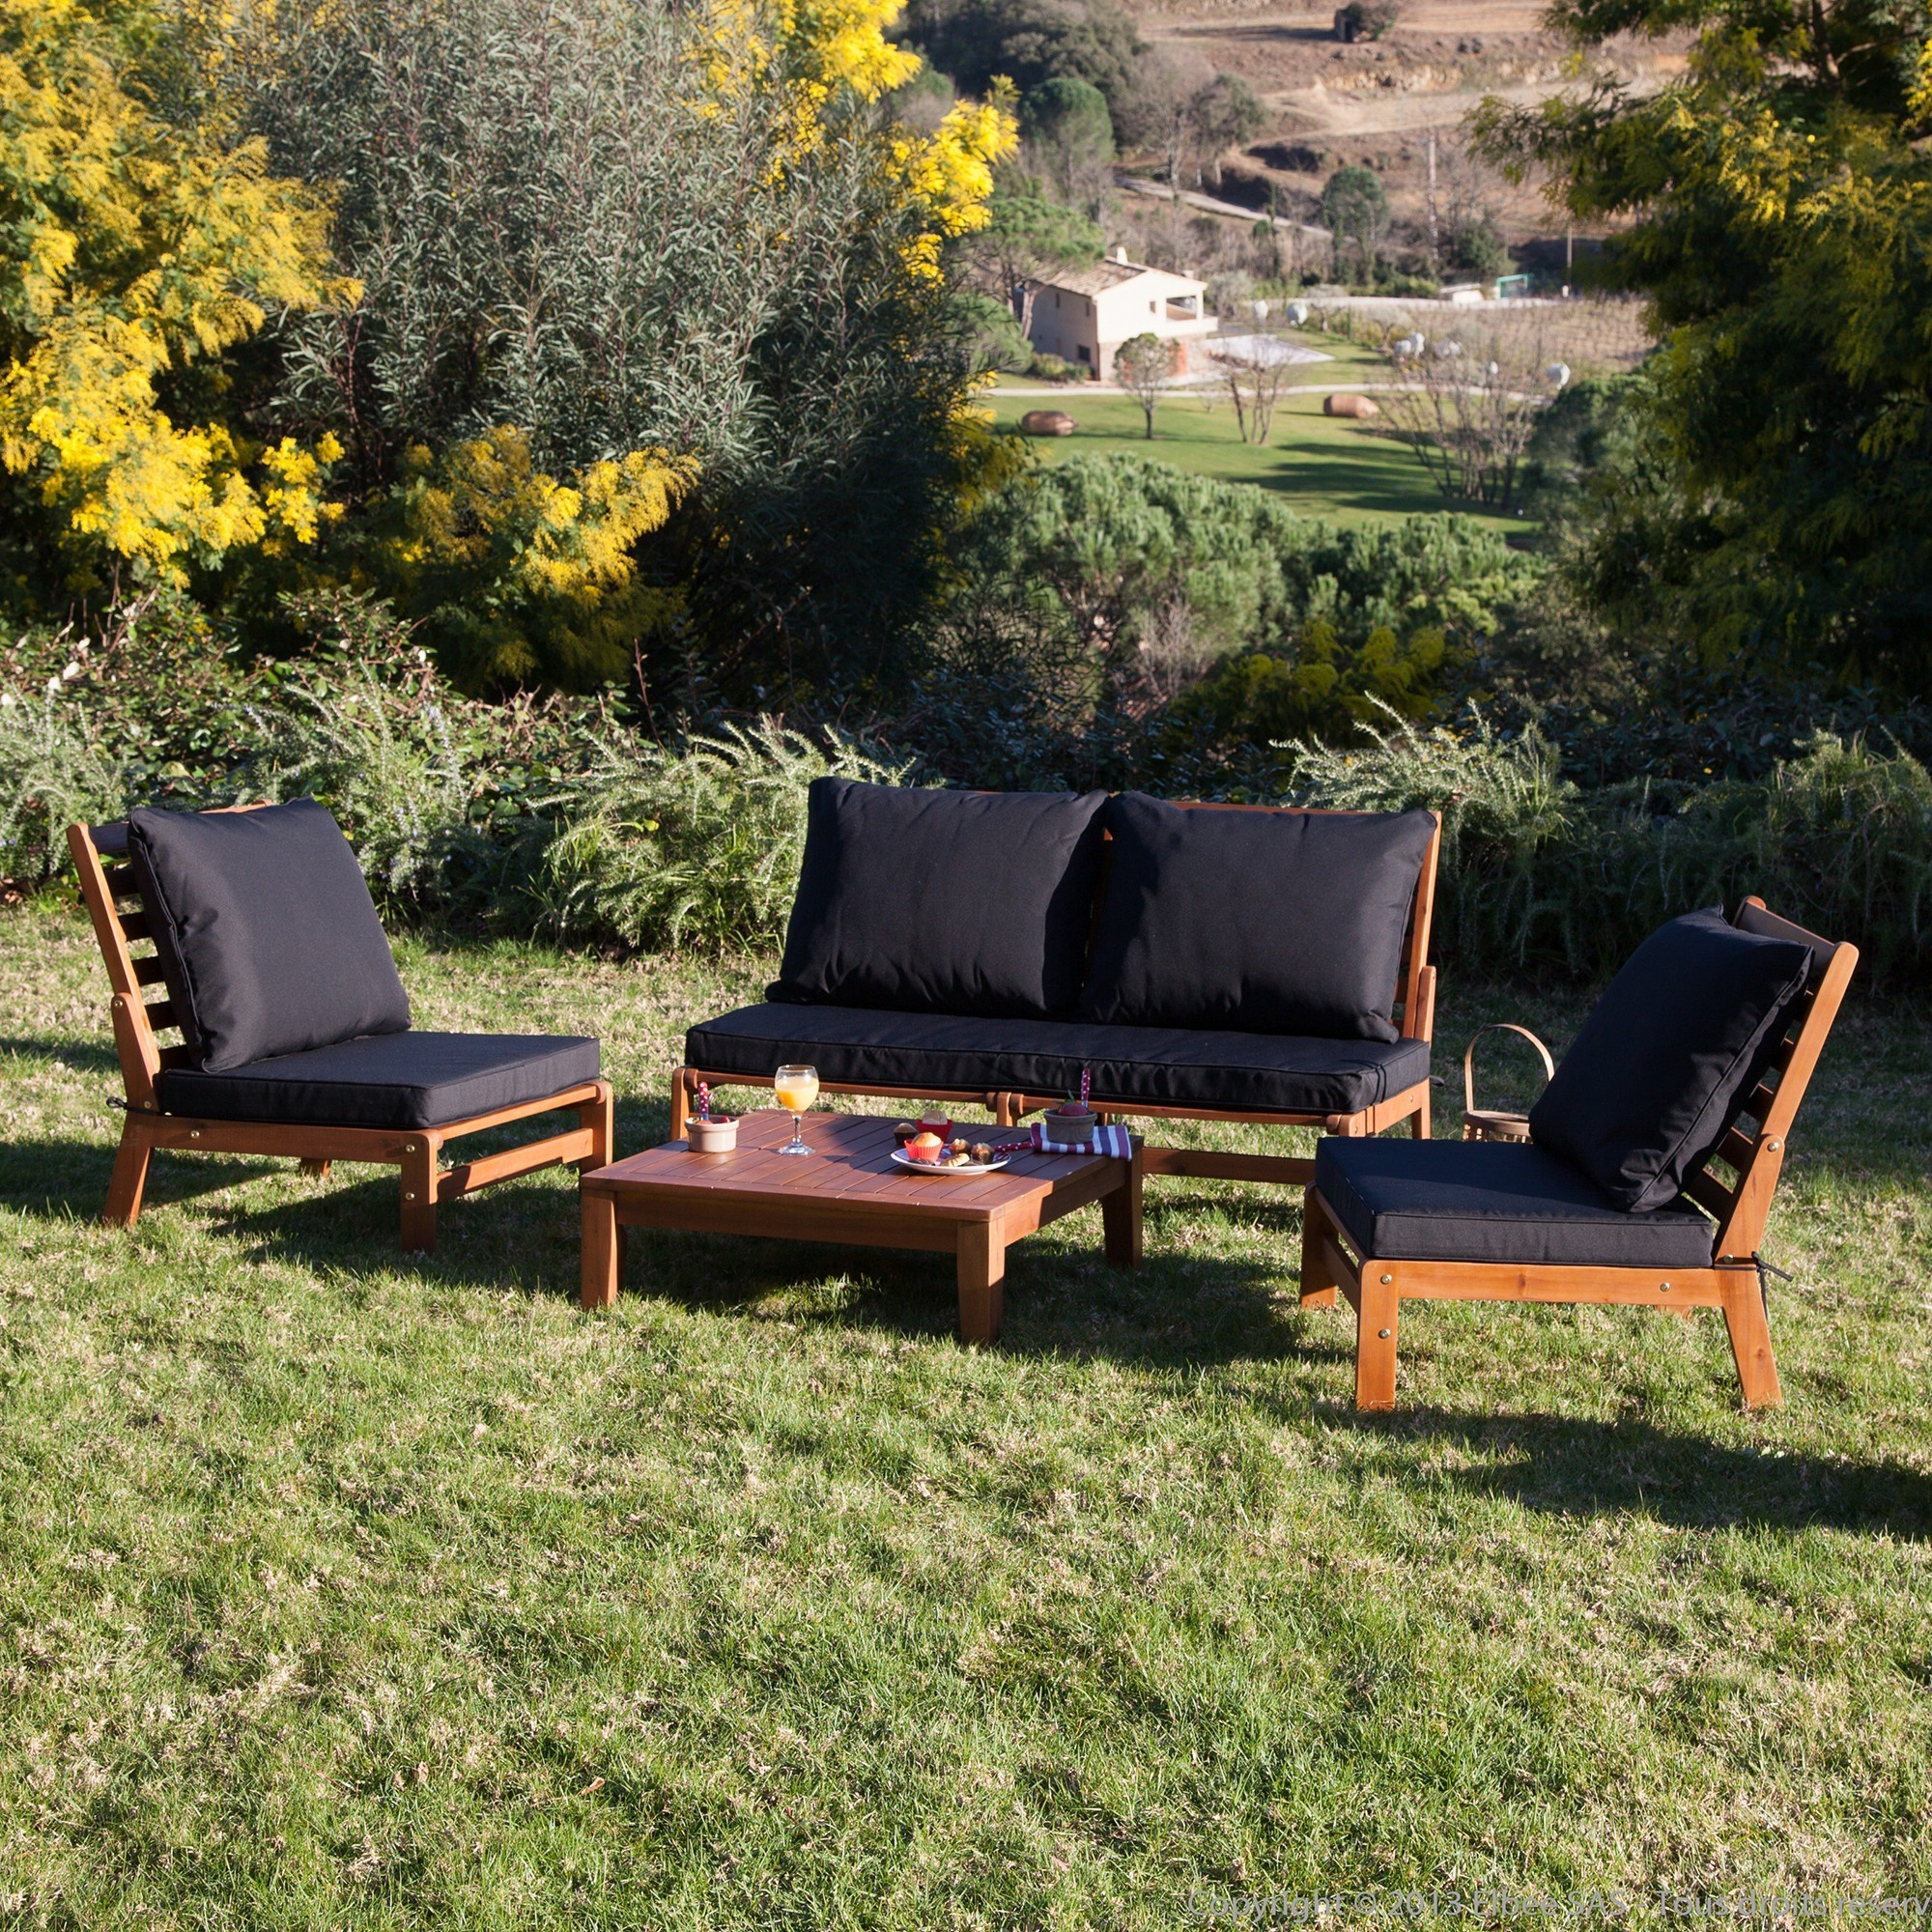 Mobilier Jardin Castorama Impressionnant Galerie Meubles De Jardin Castorama Beau Castorama Chaise Nouveau Table